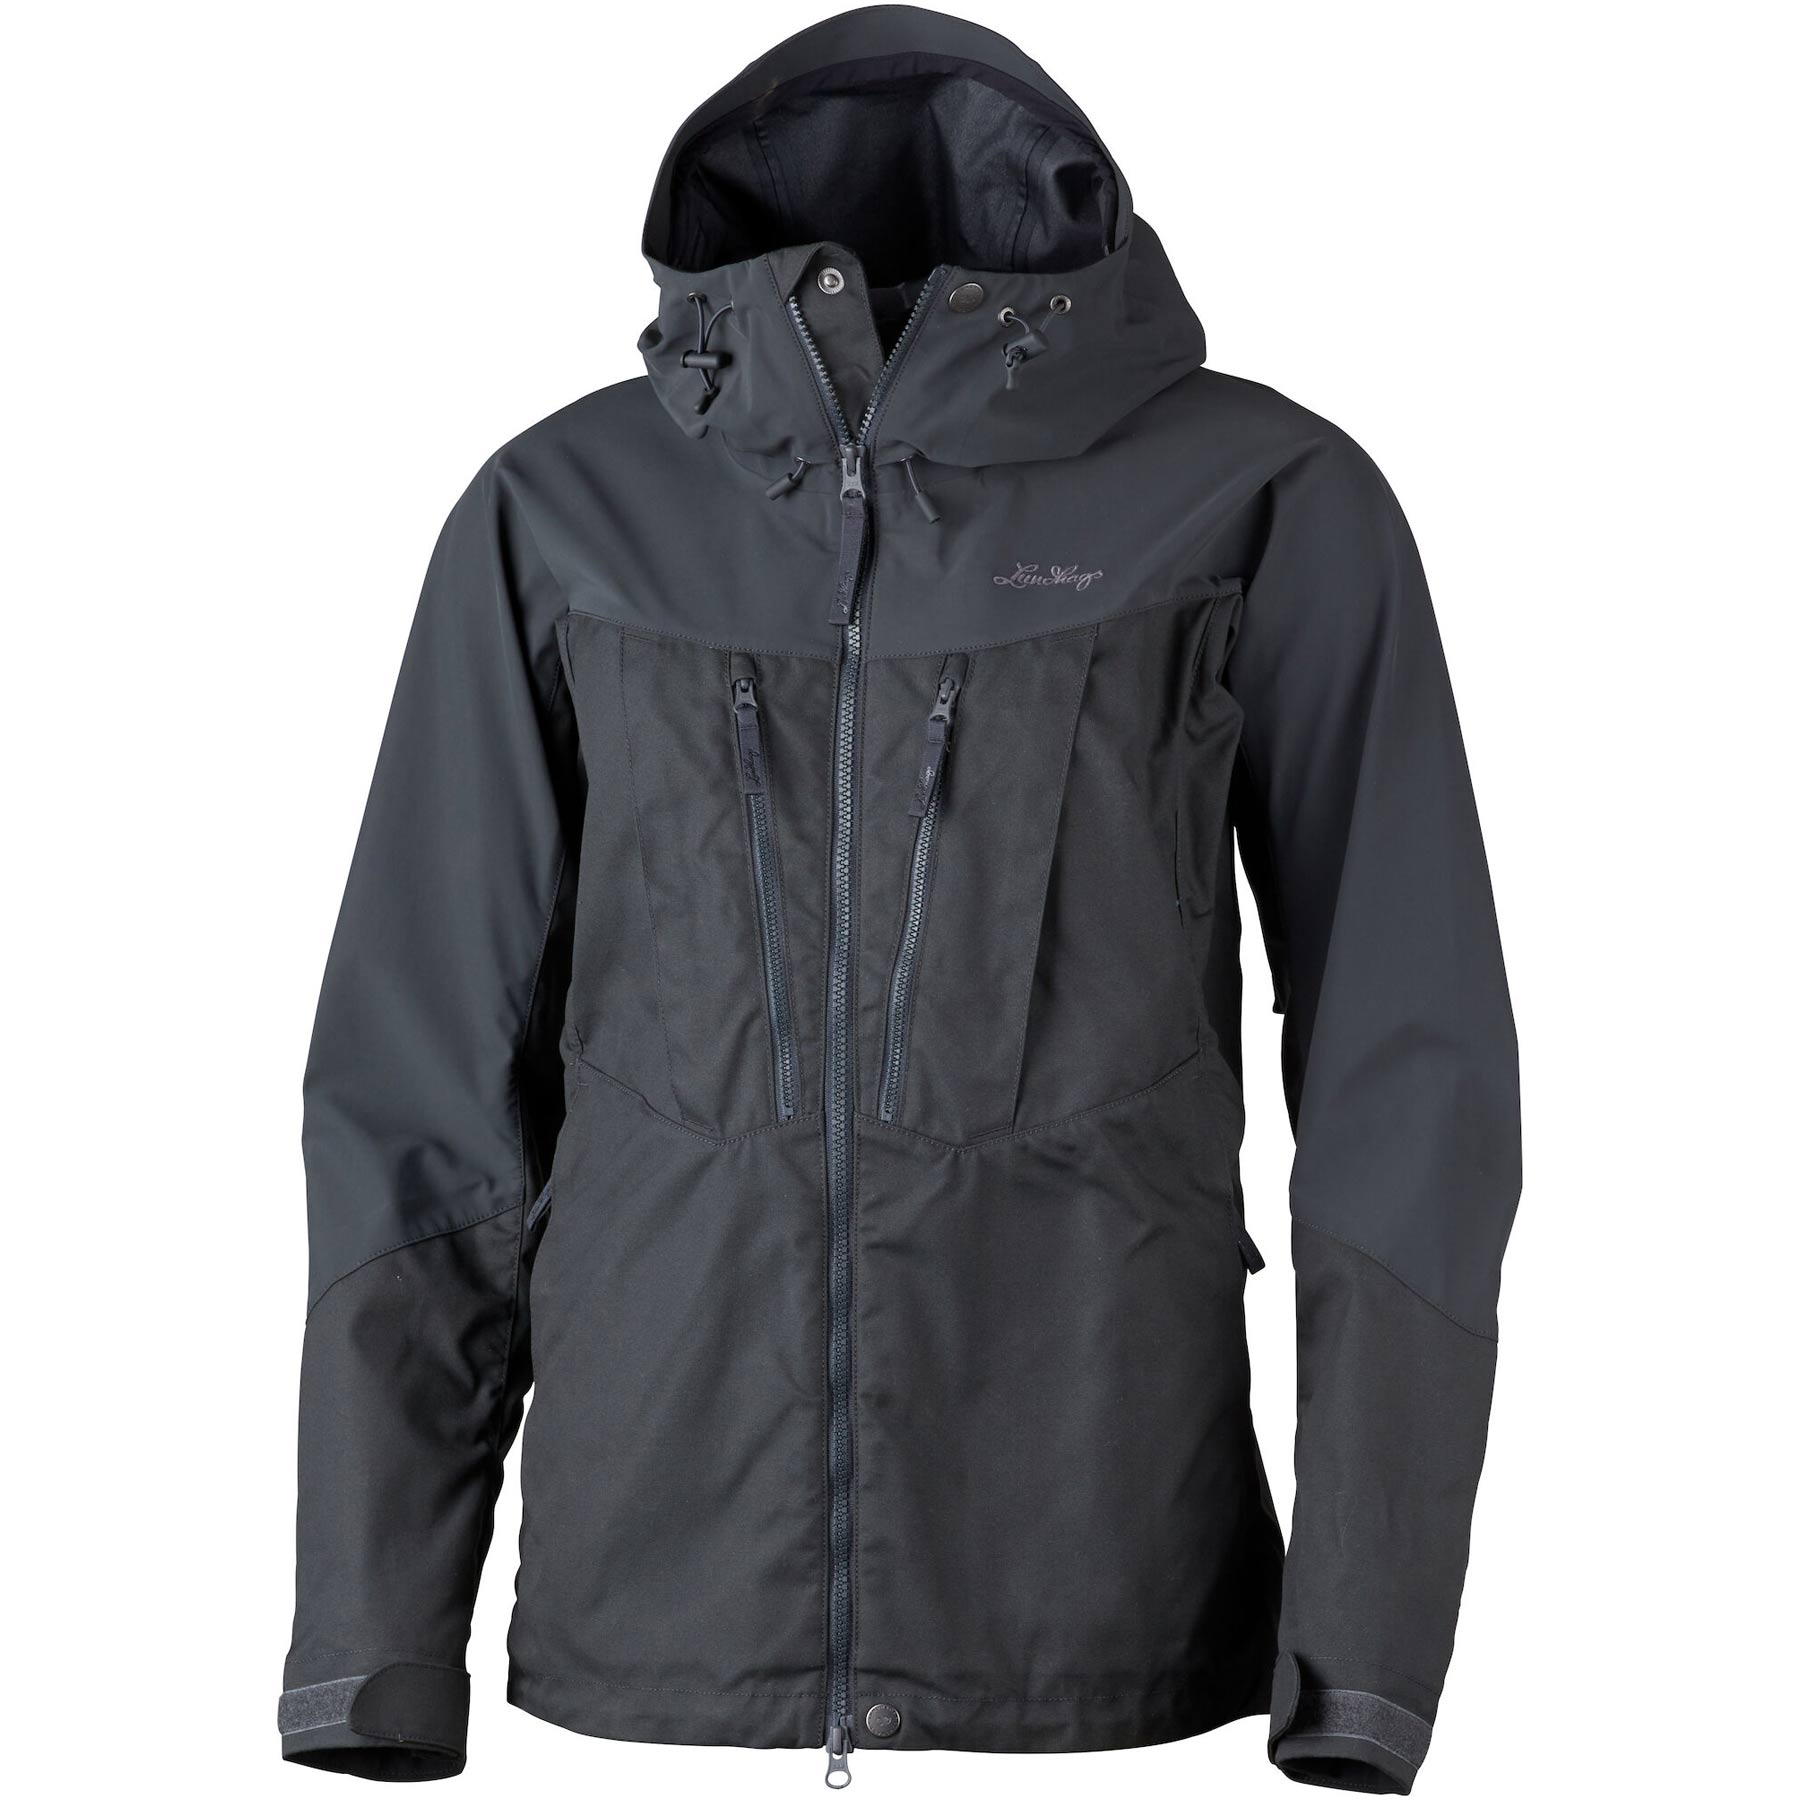 Lundhags Makke Pro Women's Jacket - Charcoal 890